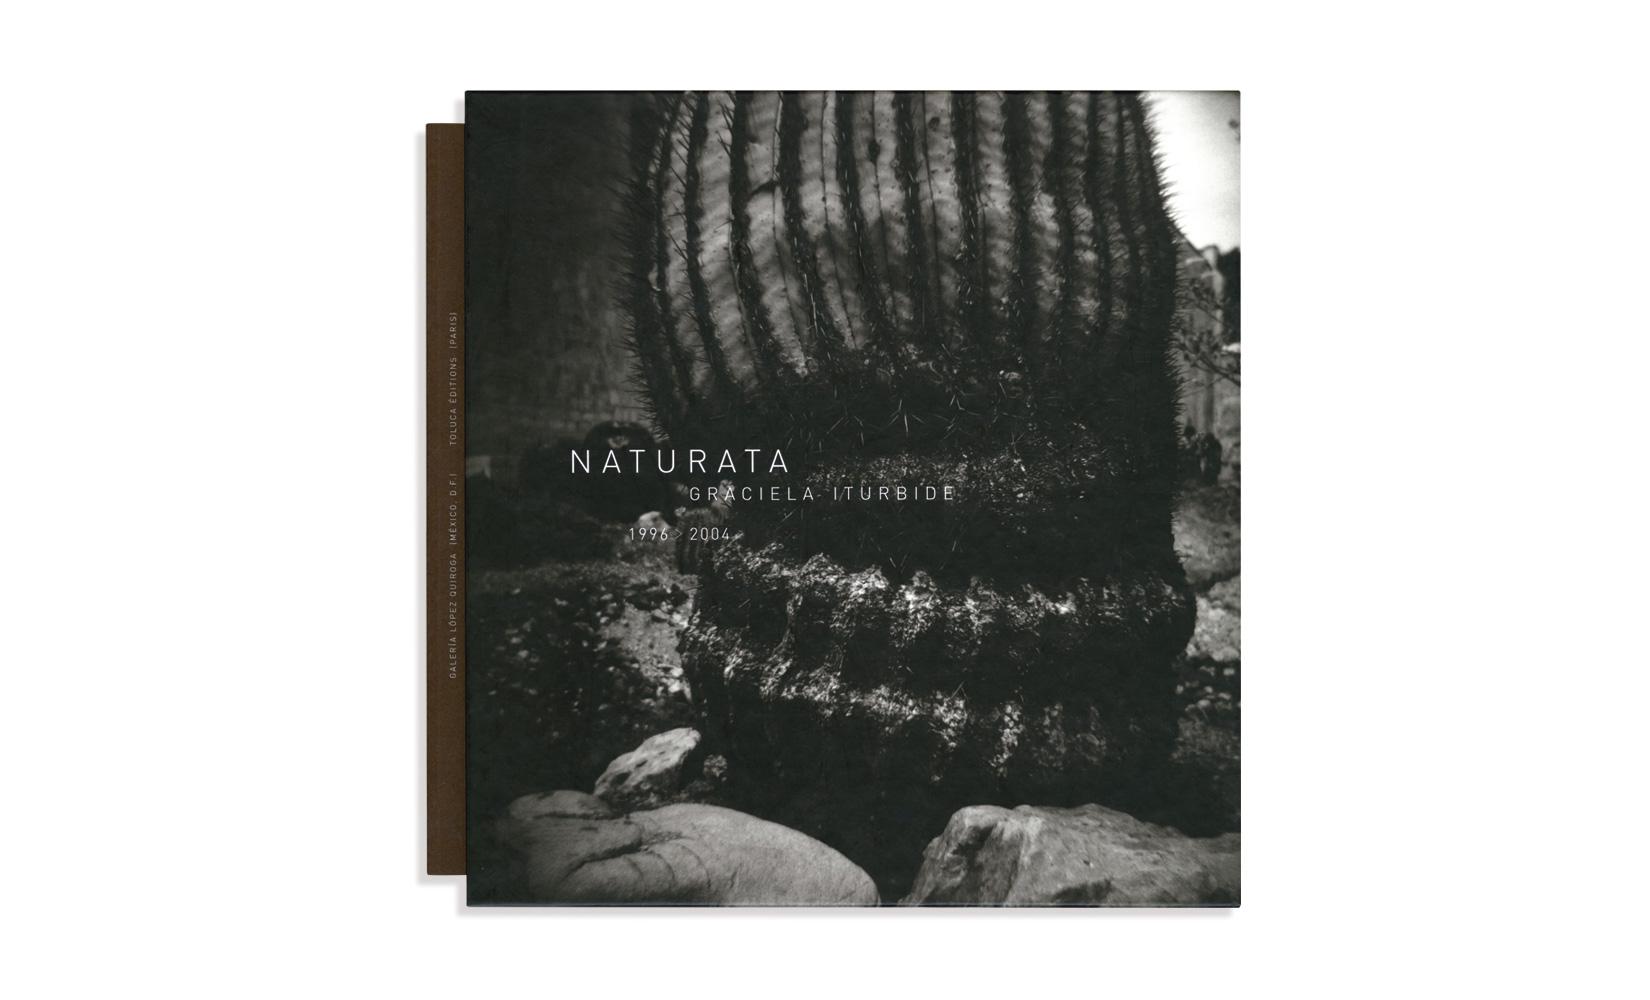 Naturata-home.jpg